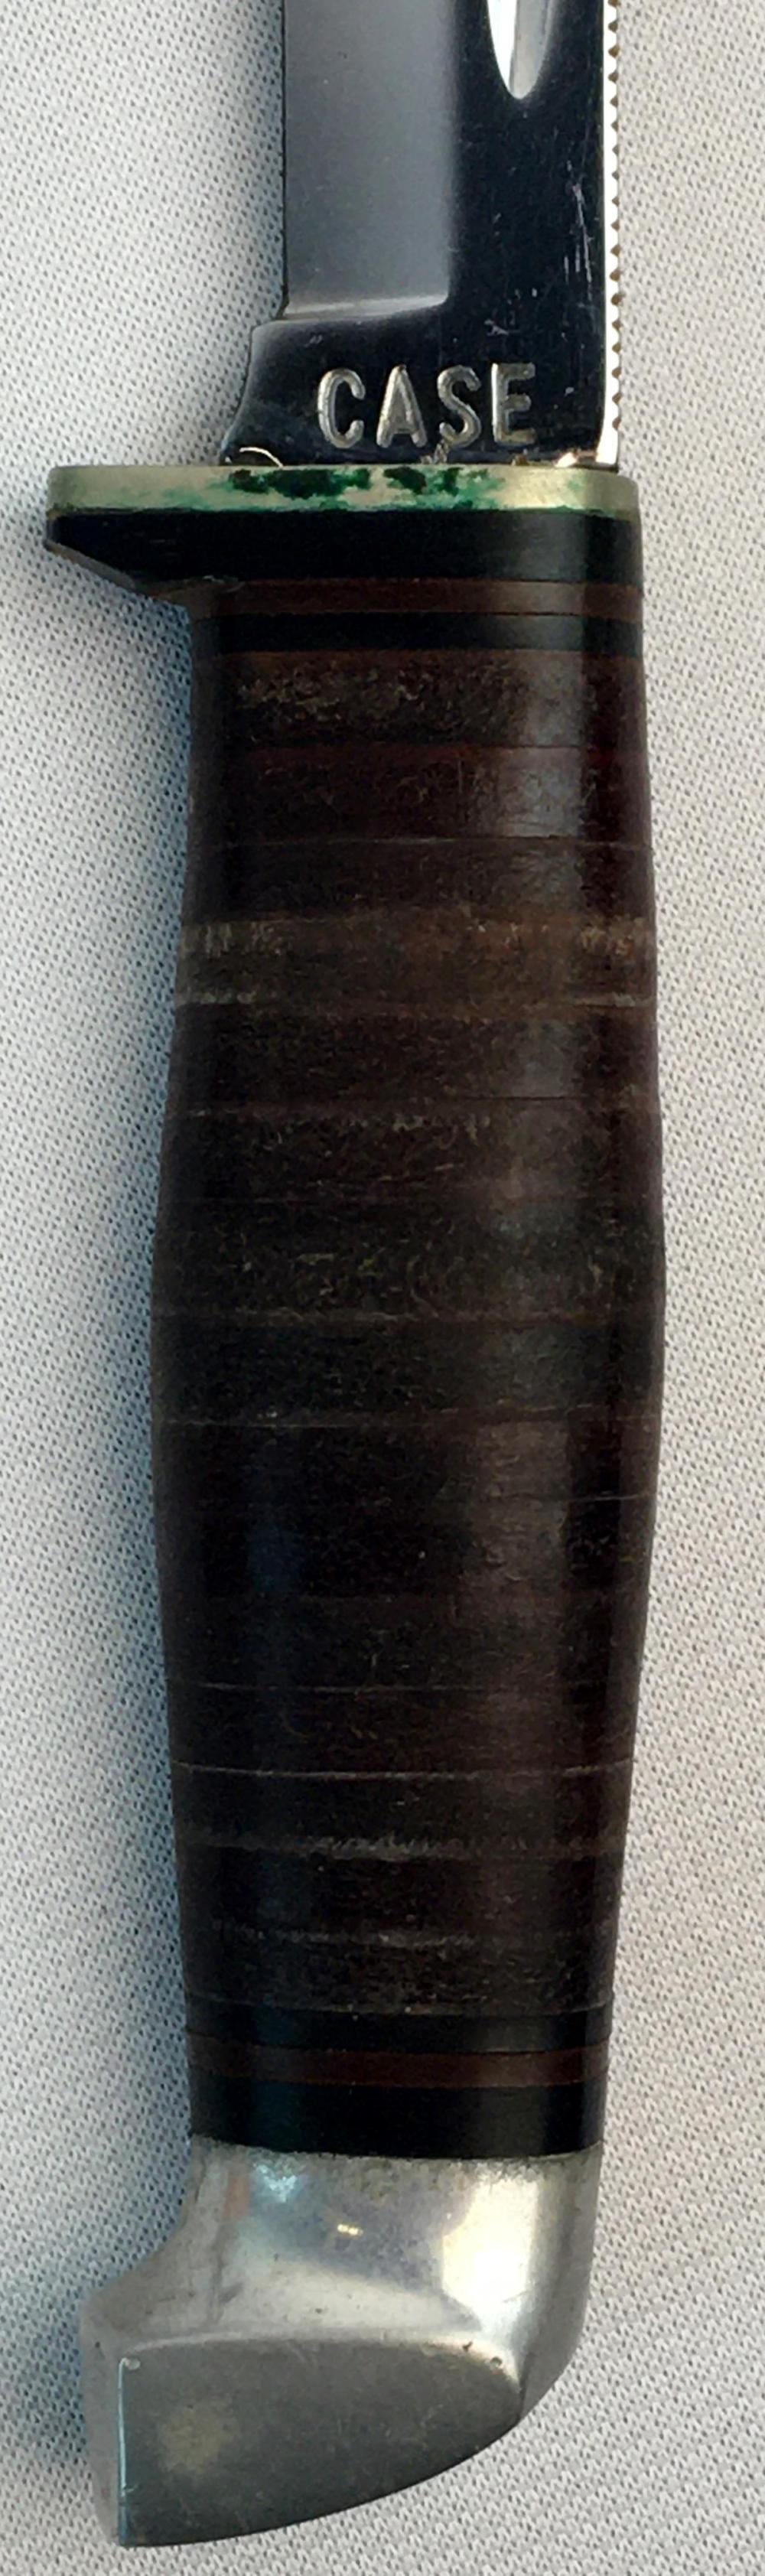 Vintage c. 1950 CASE Fixed Blade Knife w/ Case XX Tooled Leather Sheath